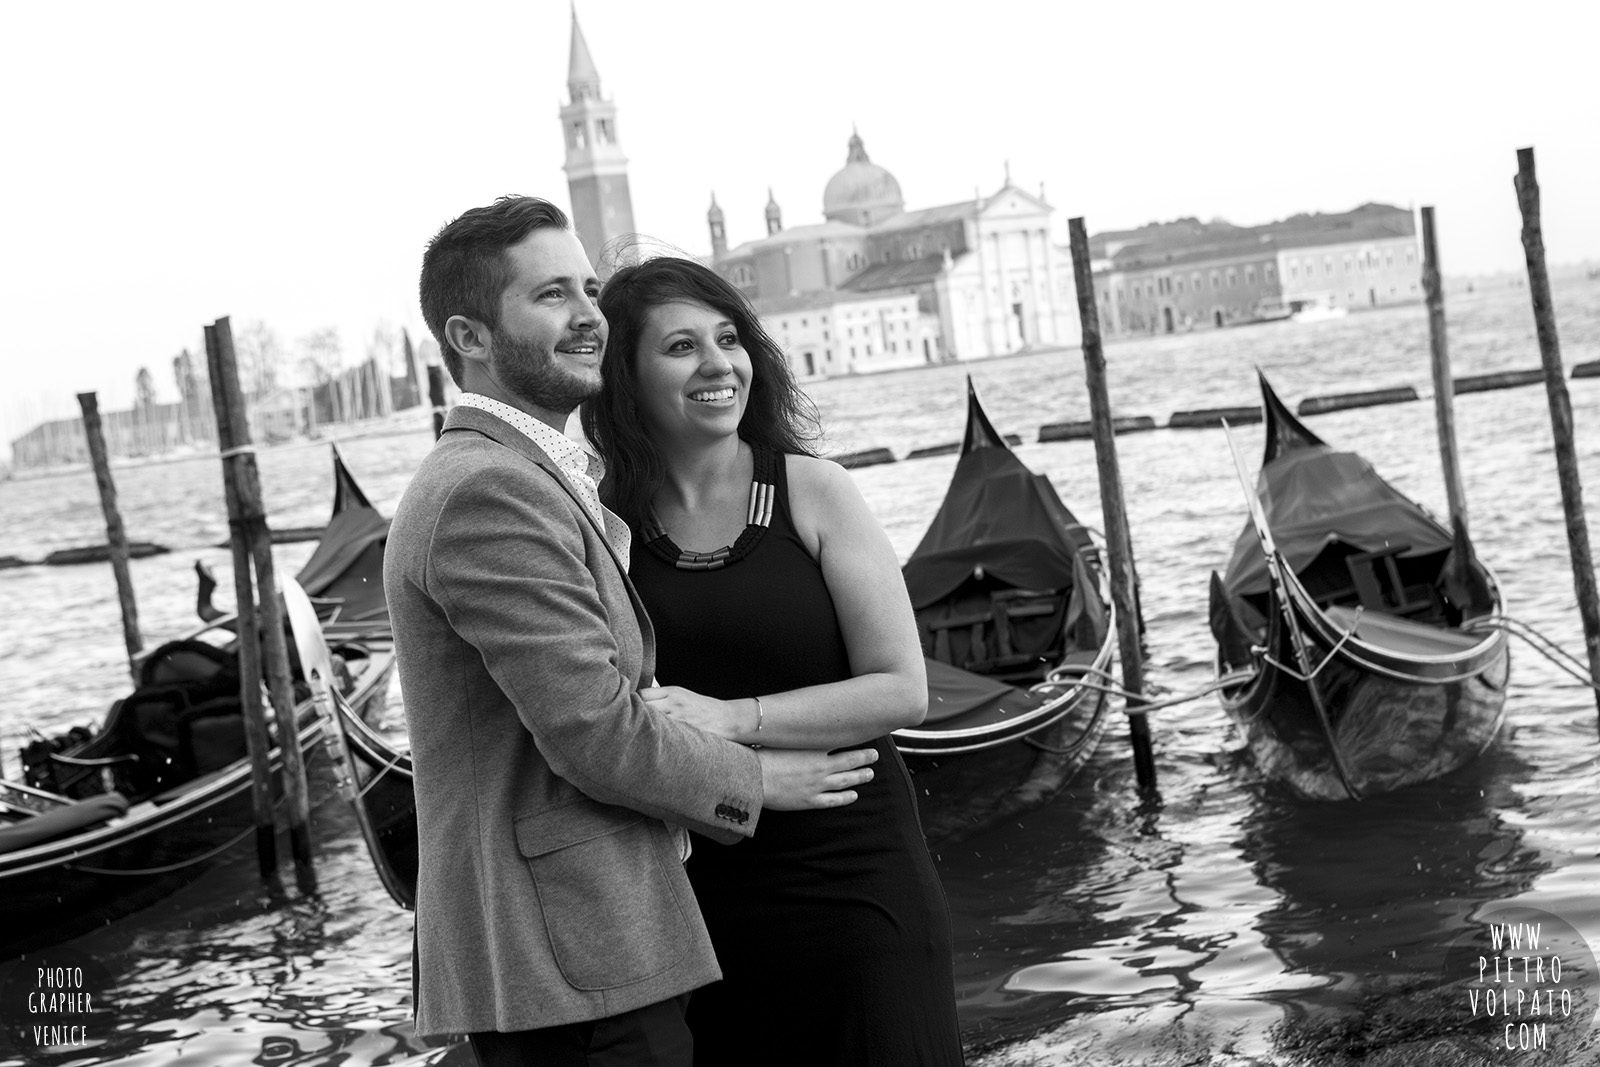 photographer-venice-photoshoot-couple-romantic-vacation-20160417_10